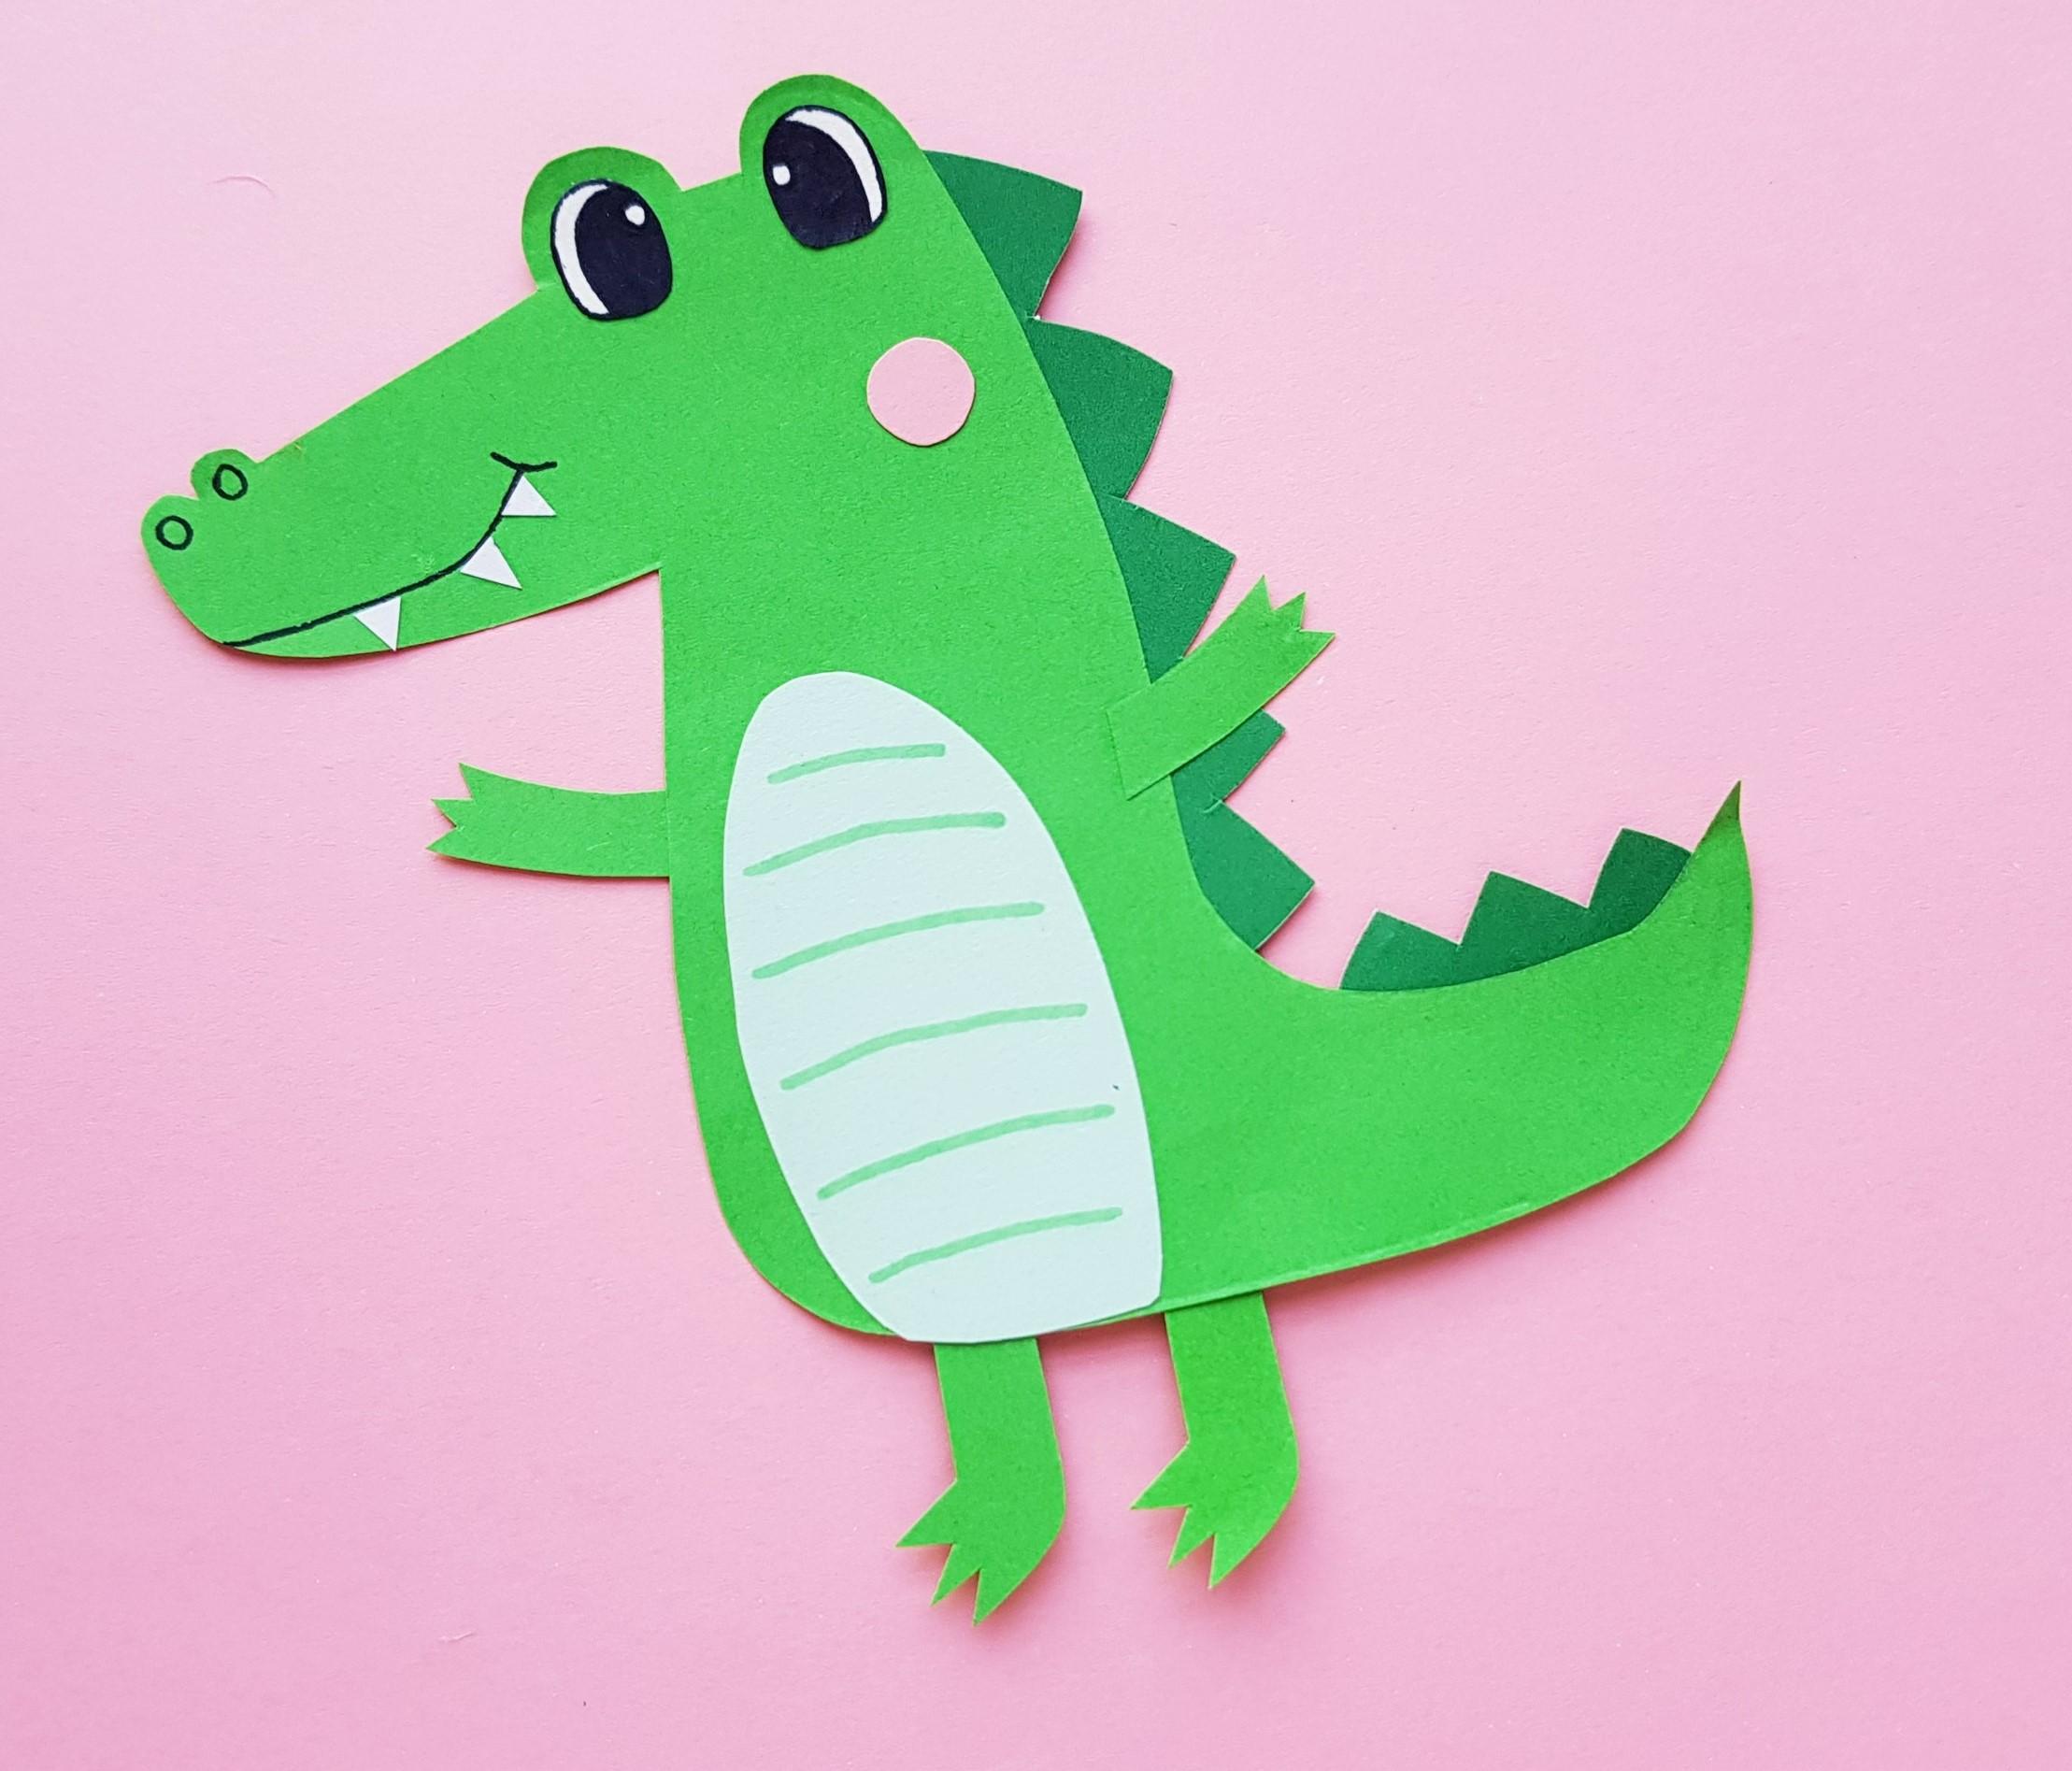 green papercraft alligator on pink paper